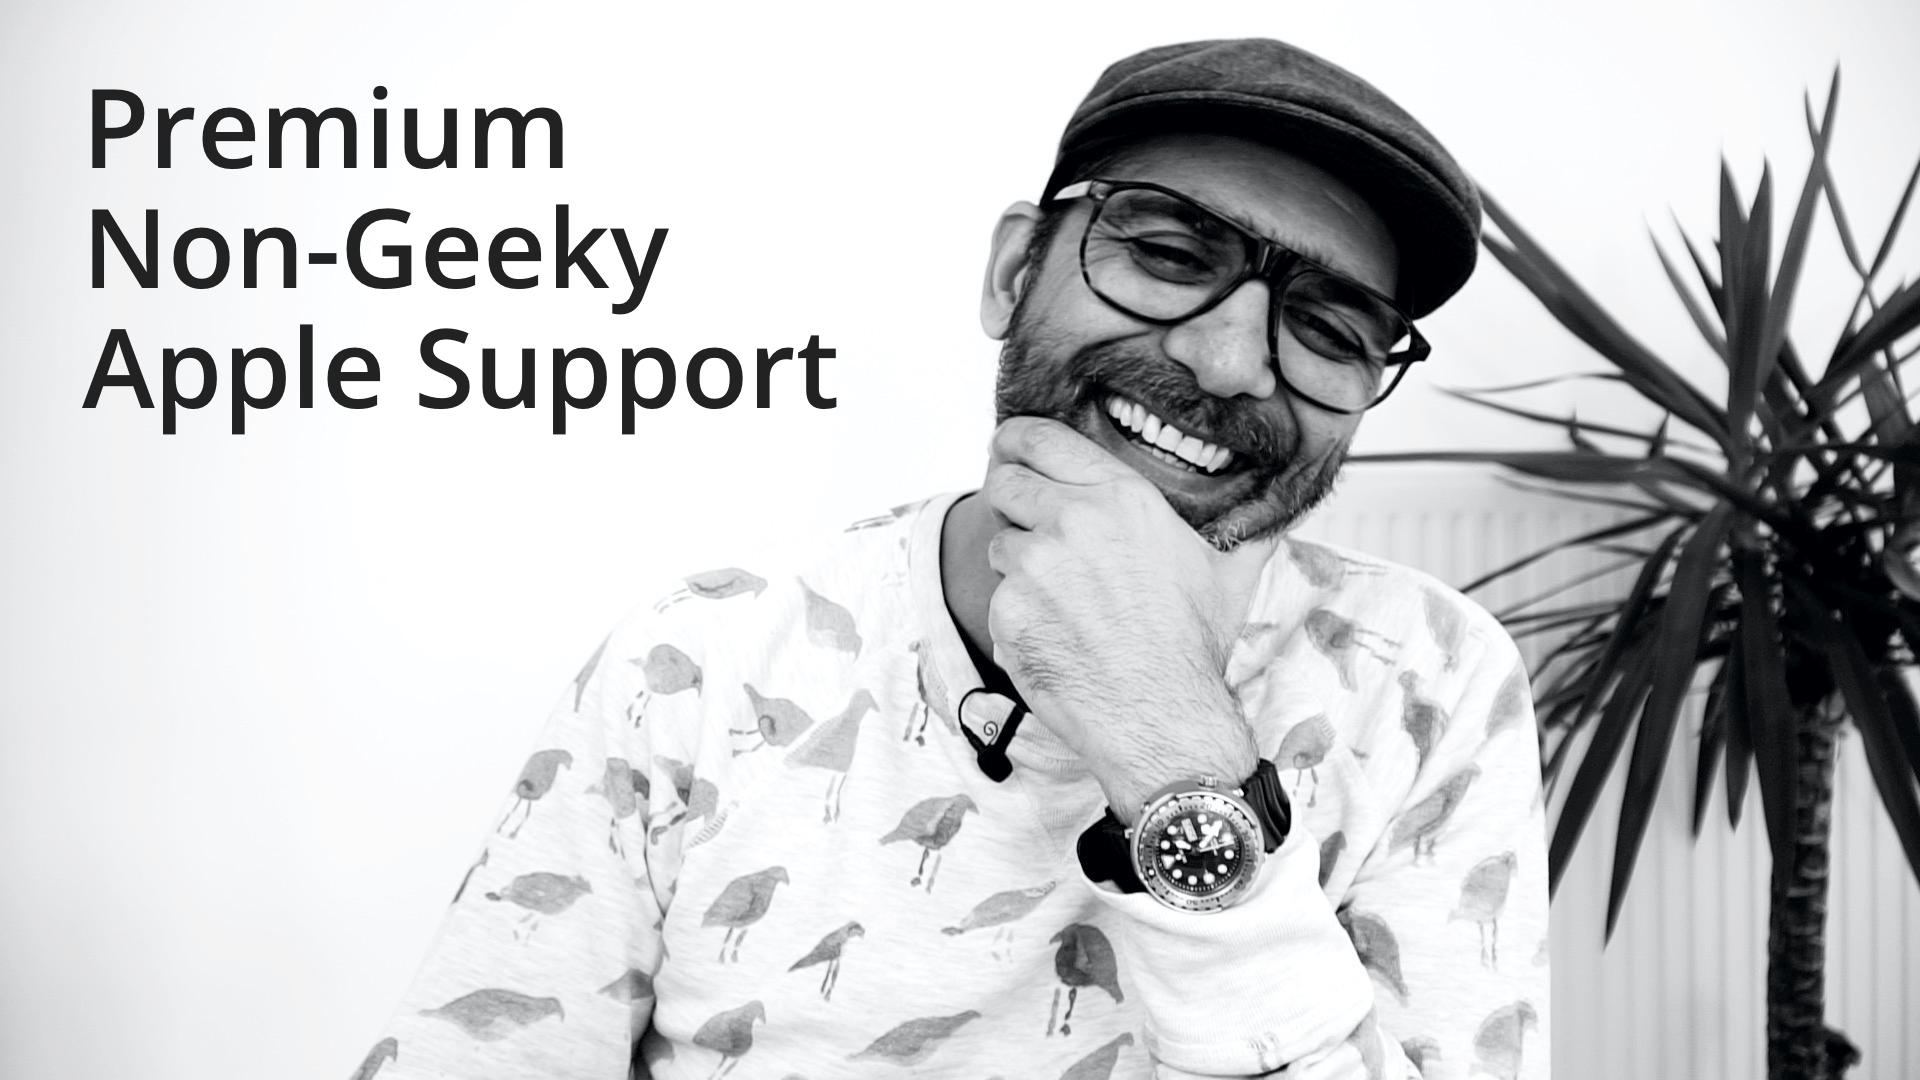 Premium Non-Geeky Apple Consulting